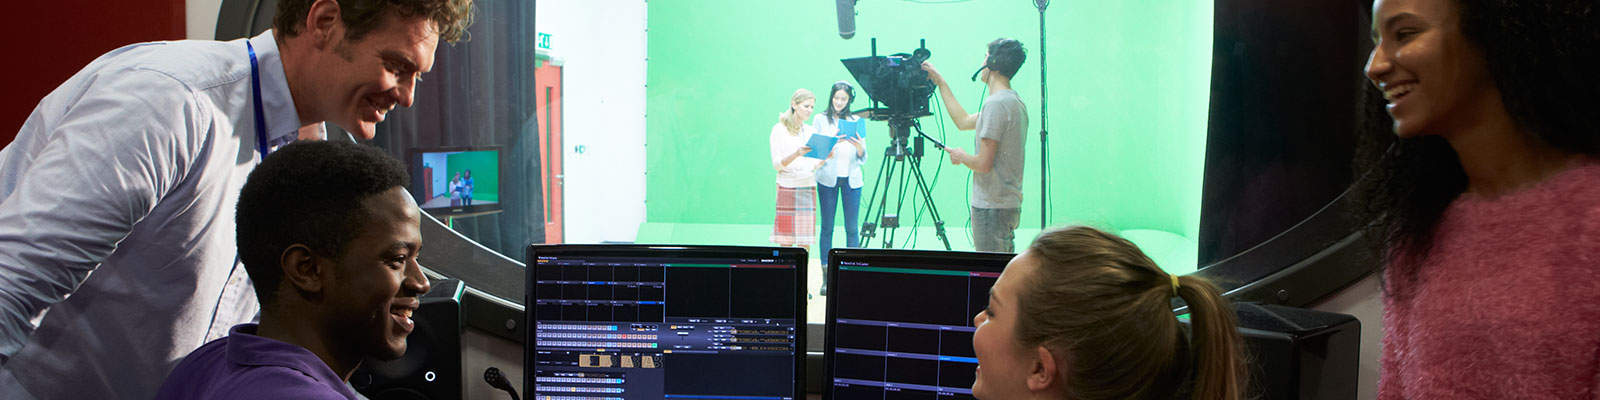 FILM SCHOOL INSURANCE | Royalty-free stock photo ID: 296315192, Shutterstock